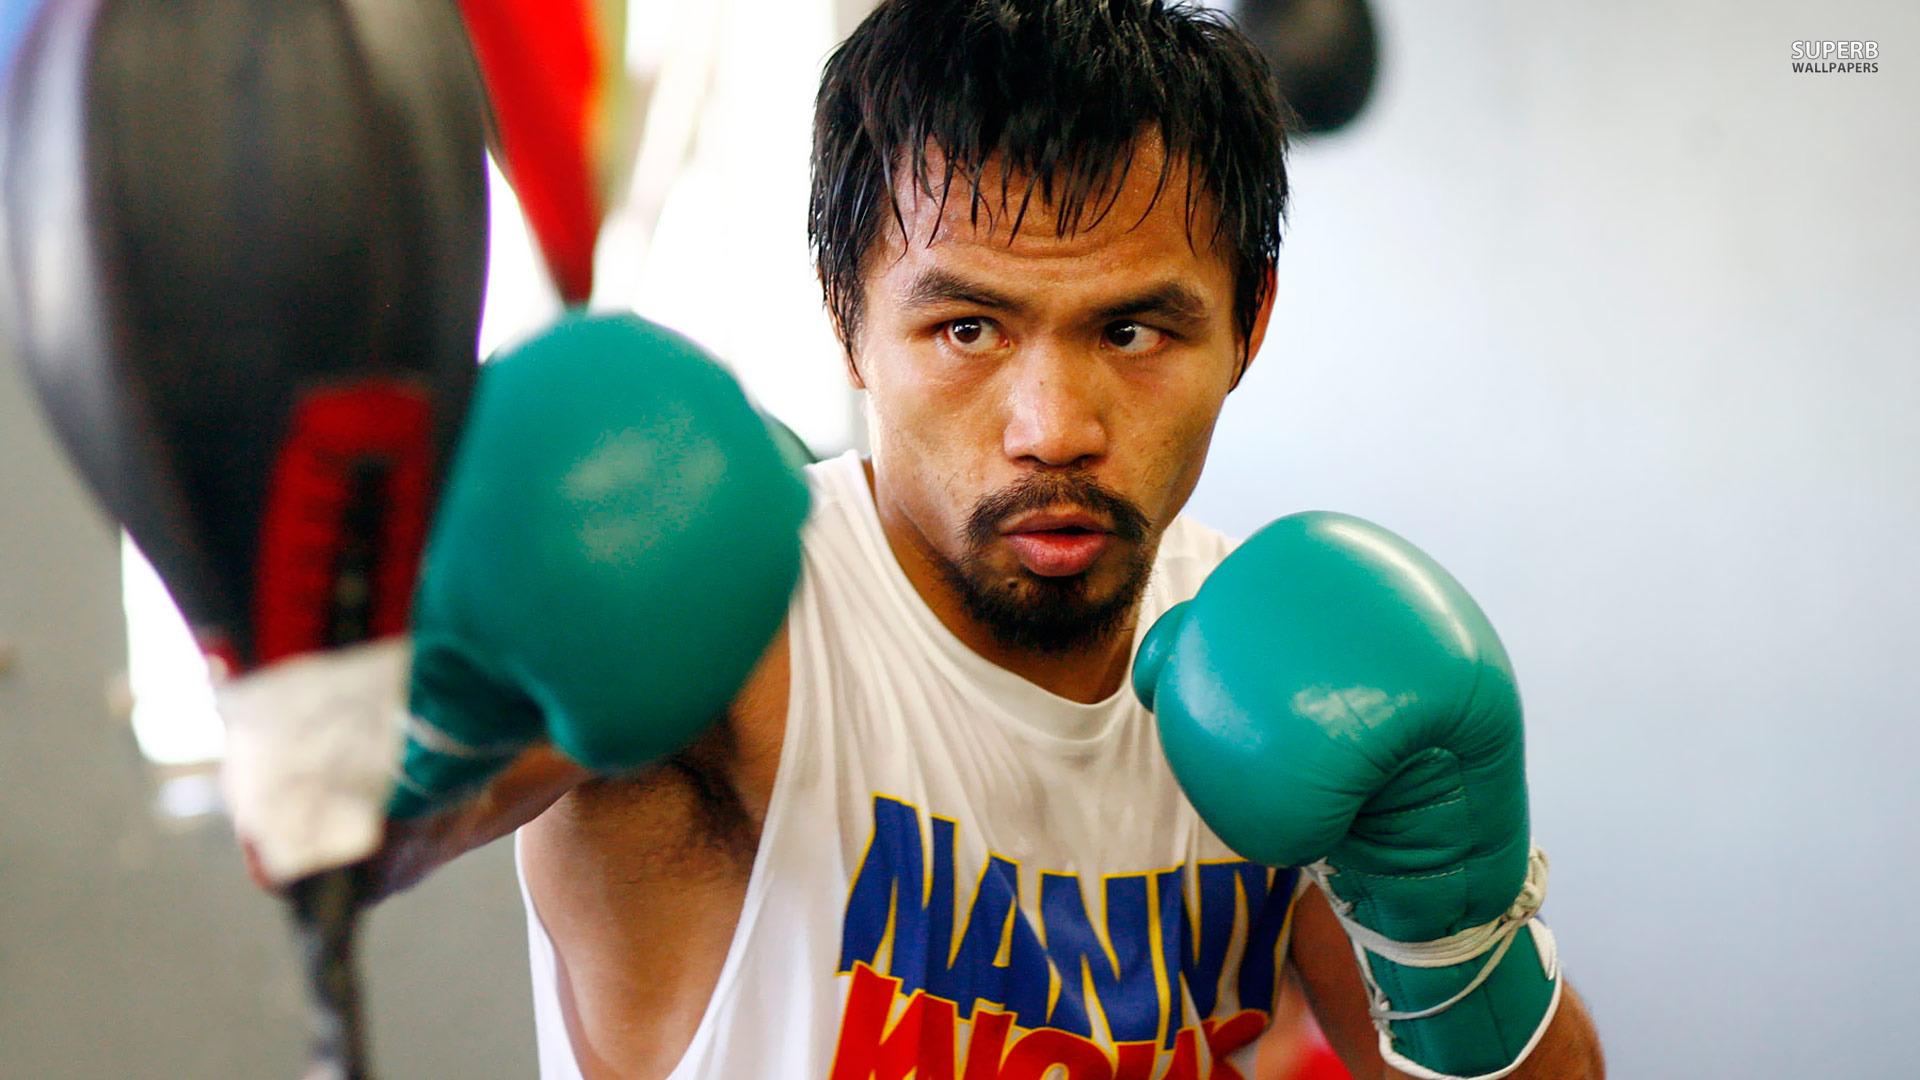 Pacquiao reitera deseo de enfrentar a Mayweather